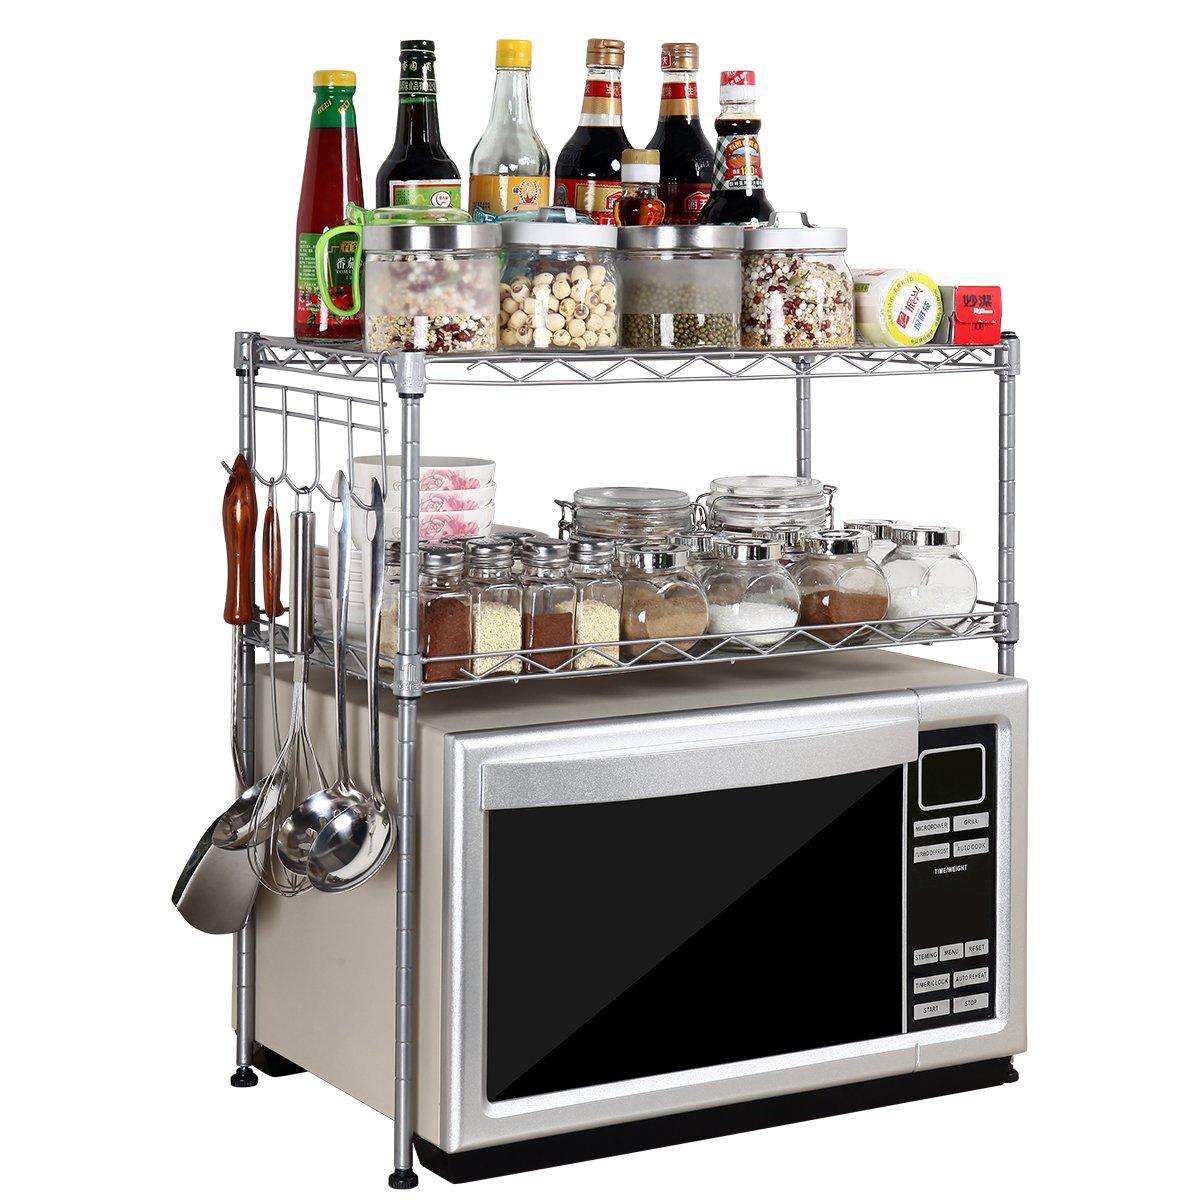 USUN Silver Steel 2-Tier D30cm W55cm H55cm Adjustable Microwave Oven Storage Rack Kitchen Tableware Shelves Counter and Cabinet Shelf with 4 Side Hooks WJG3055-SL